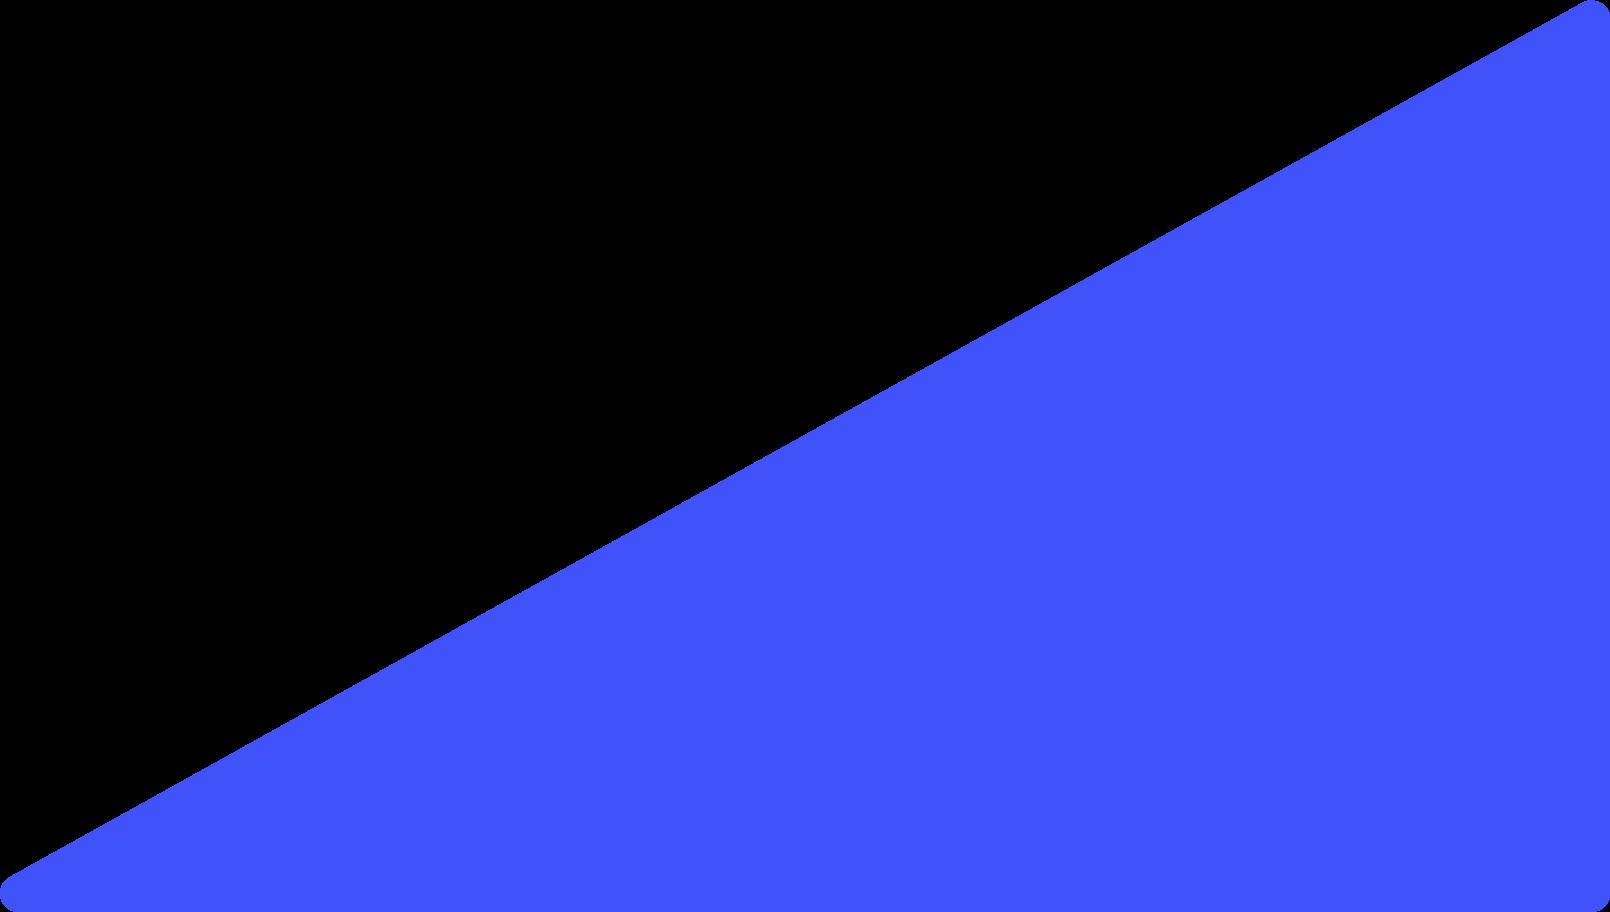 blue triagnle Clipart illustration in PNG, SVG